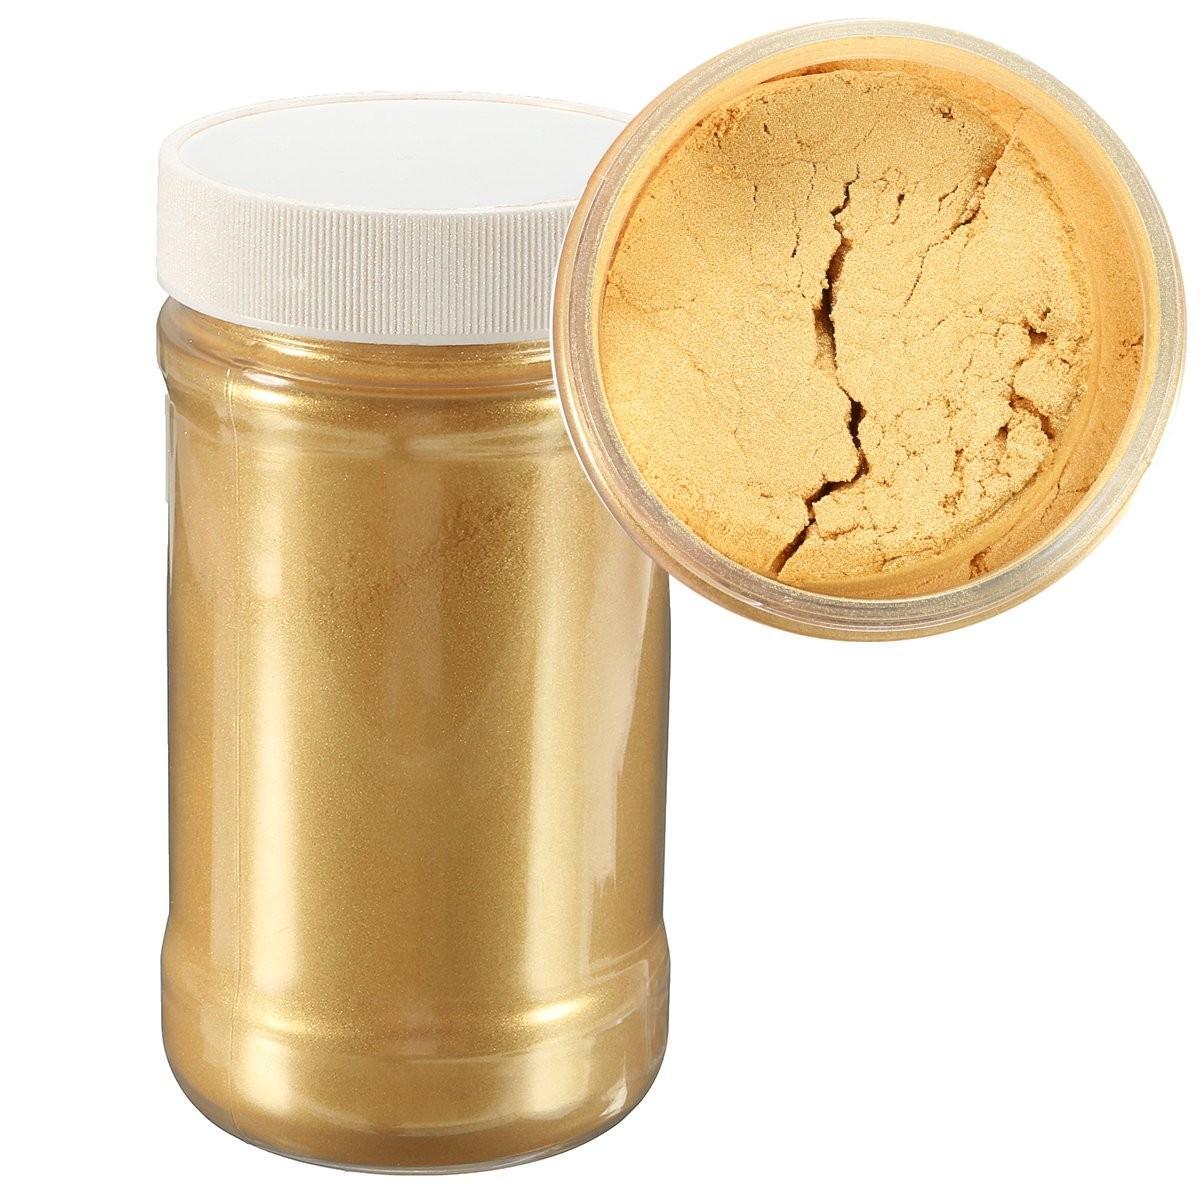 100g Gold Ultrafine Glitter Pearl Pigment Powder Metal Sparkle Shimmer Paint